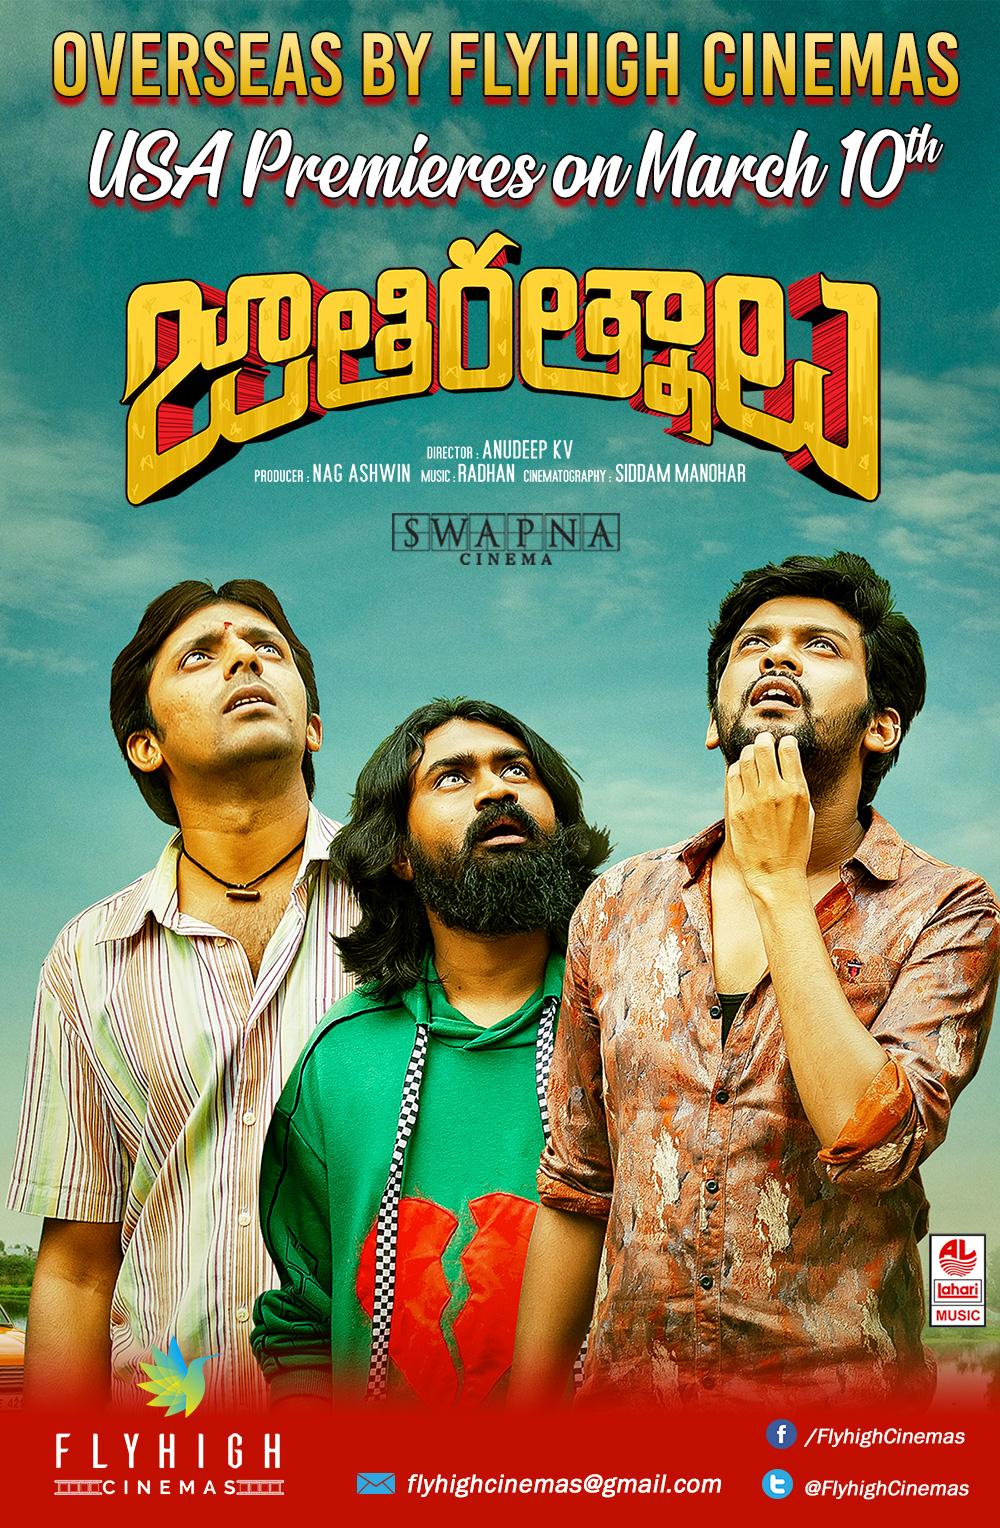 Jaathi Rathaalu overseas by Flyhigh Cinemas